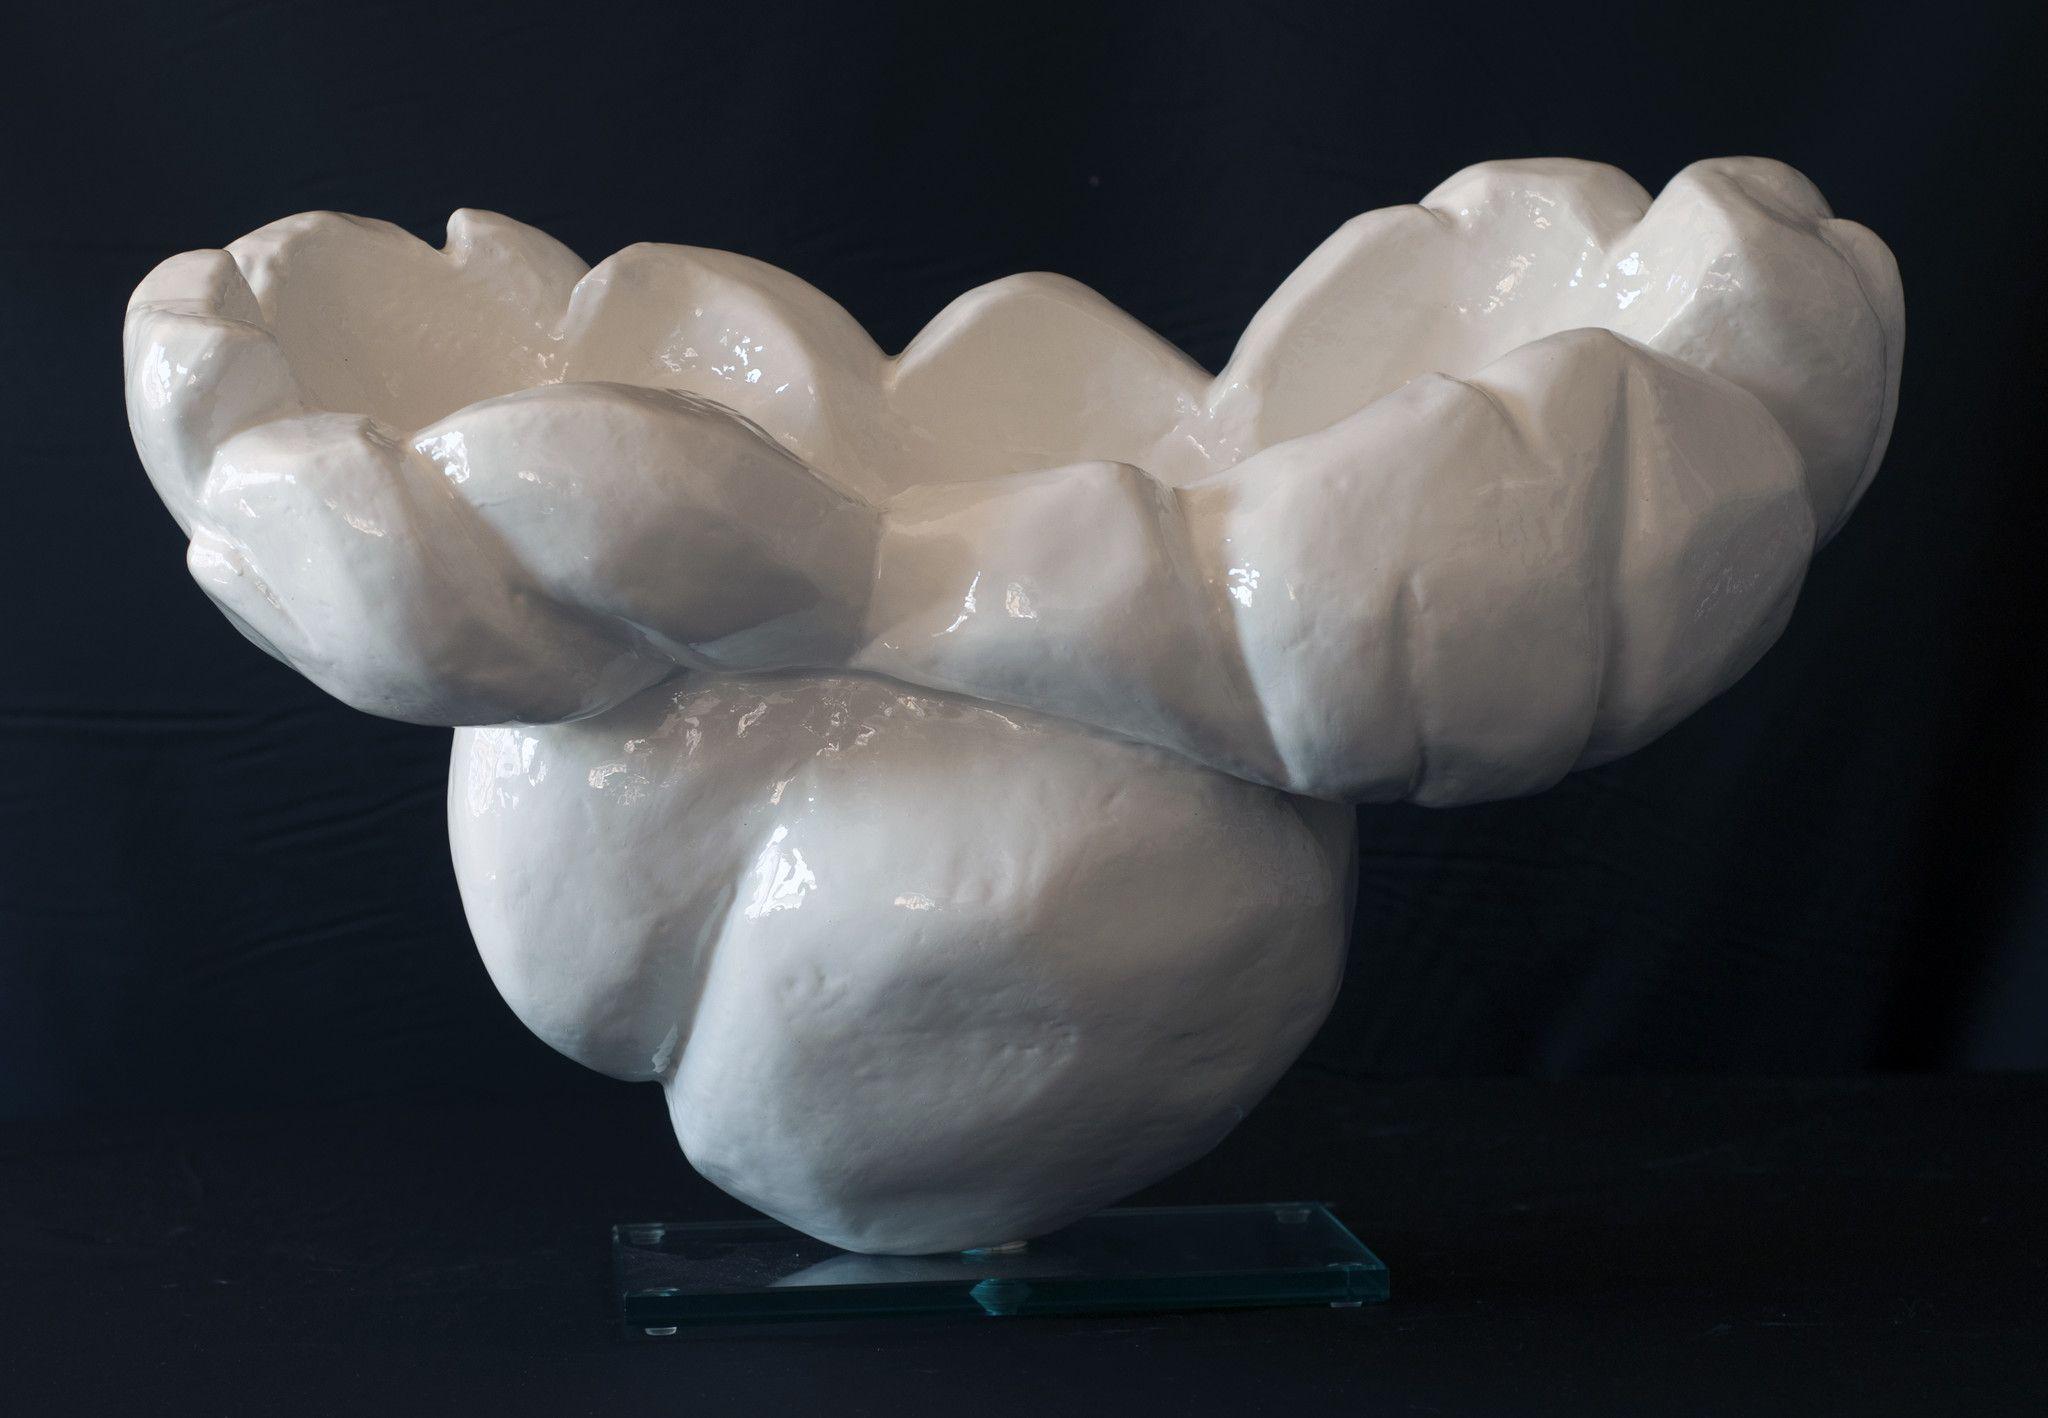 COMPLEMENTO D'ARREDO  CLAUDIO PERINA ' POP CORN # 1 '  dimensioni  L 58,5 x H 35,5 x P 26  cm.